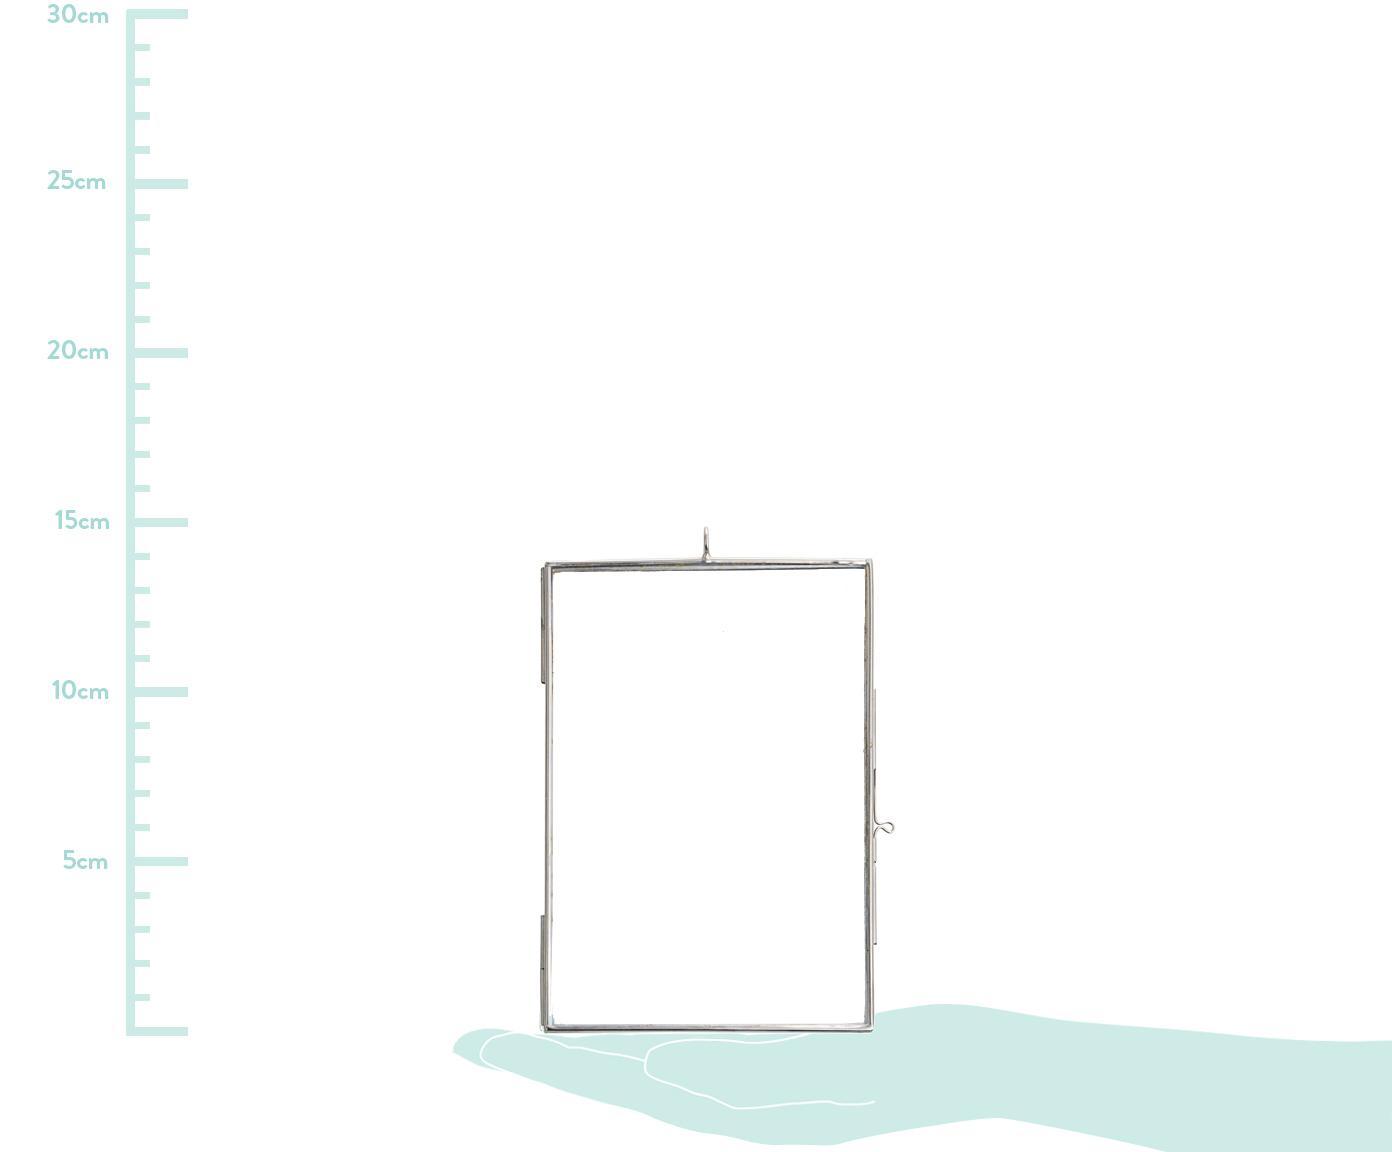 Bilderrahmen Key, Glas, Metall, beschichtet, Edelstahl, 10 x 15